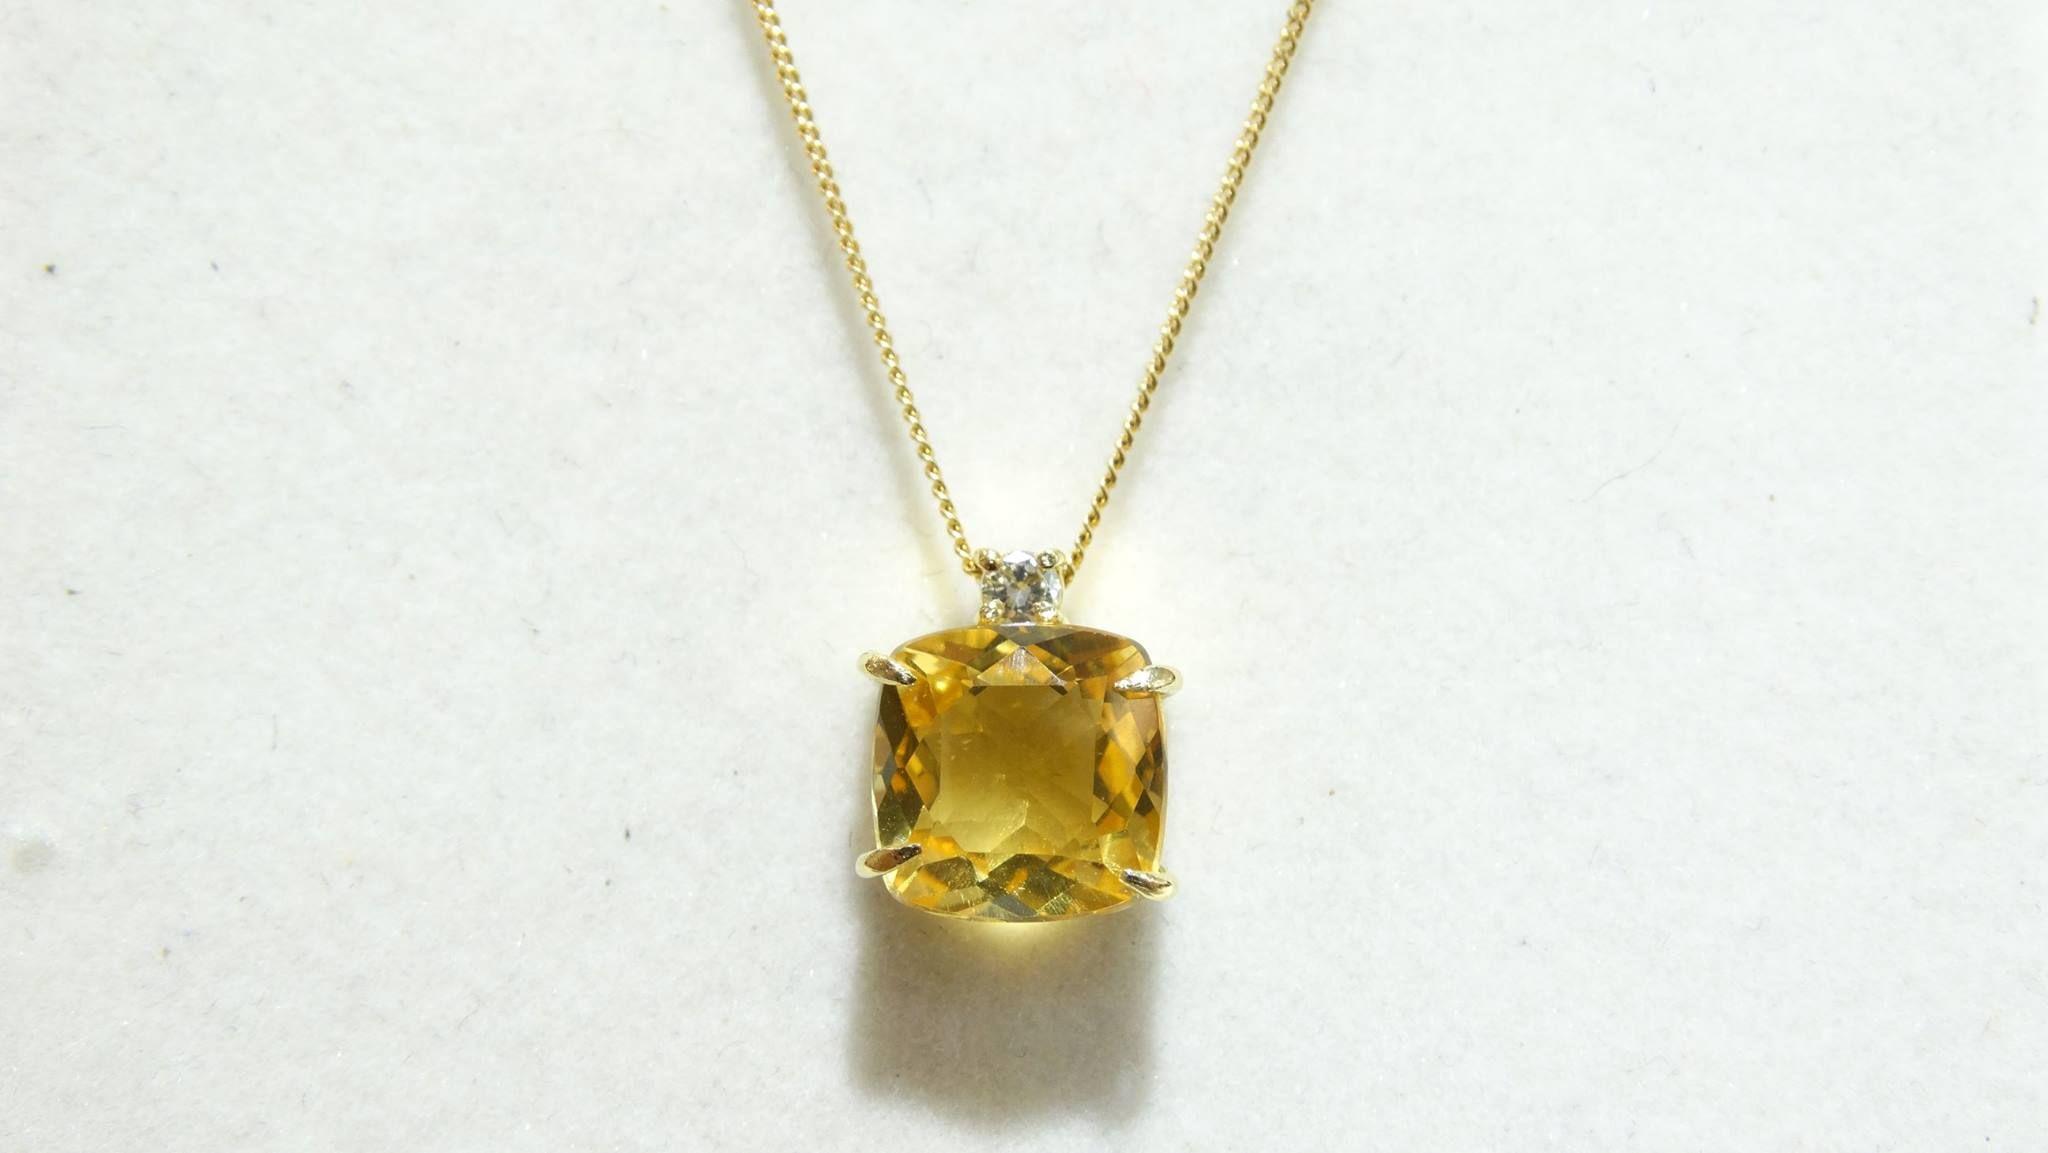 da7511a4379 Citrino e diamante ouro 18k